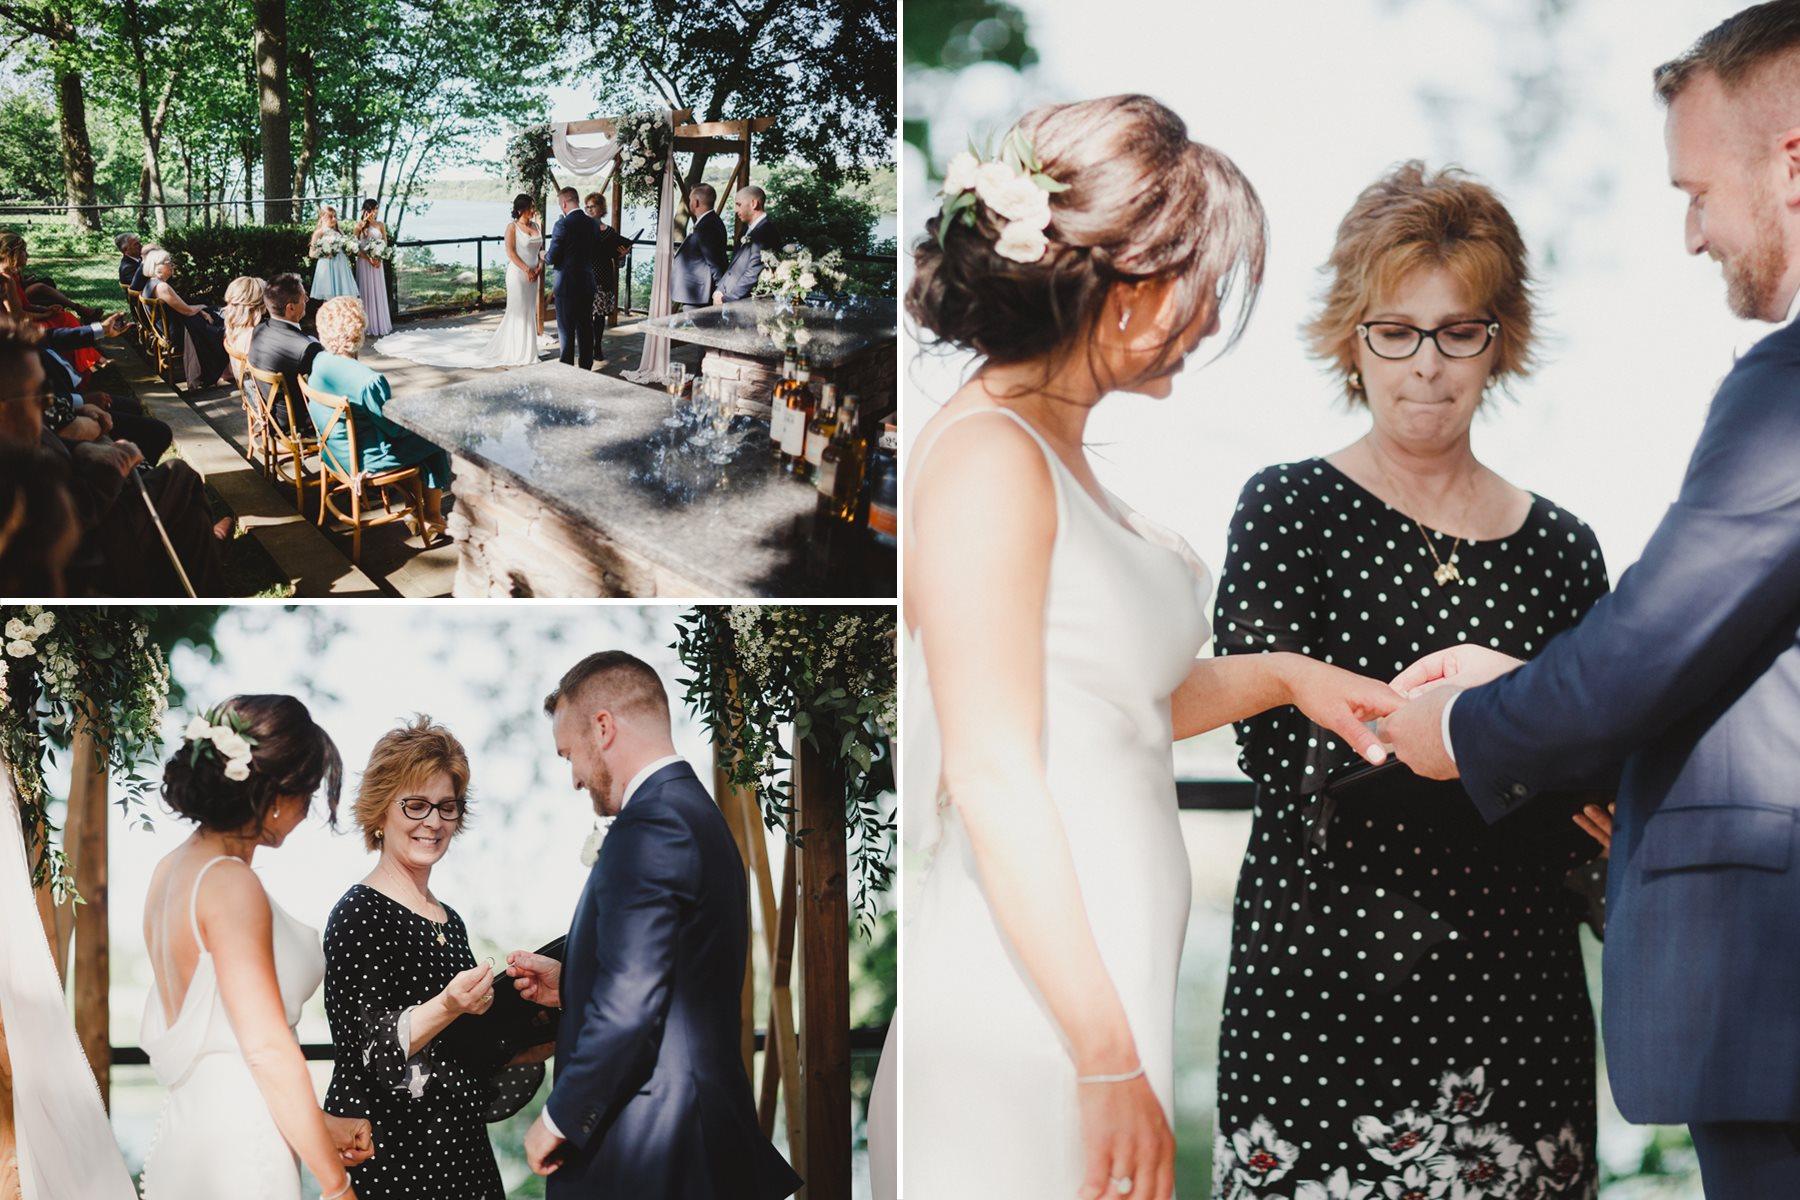 Backyard Wedding by Top 10 Toronto Wedding PhotographerBackyard Wedding by Top 10 Toronto Wedding Photographer